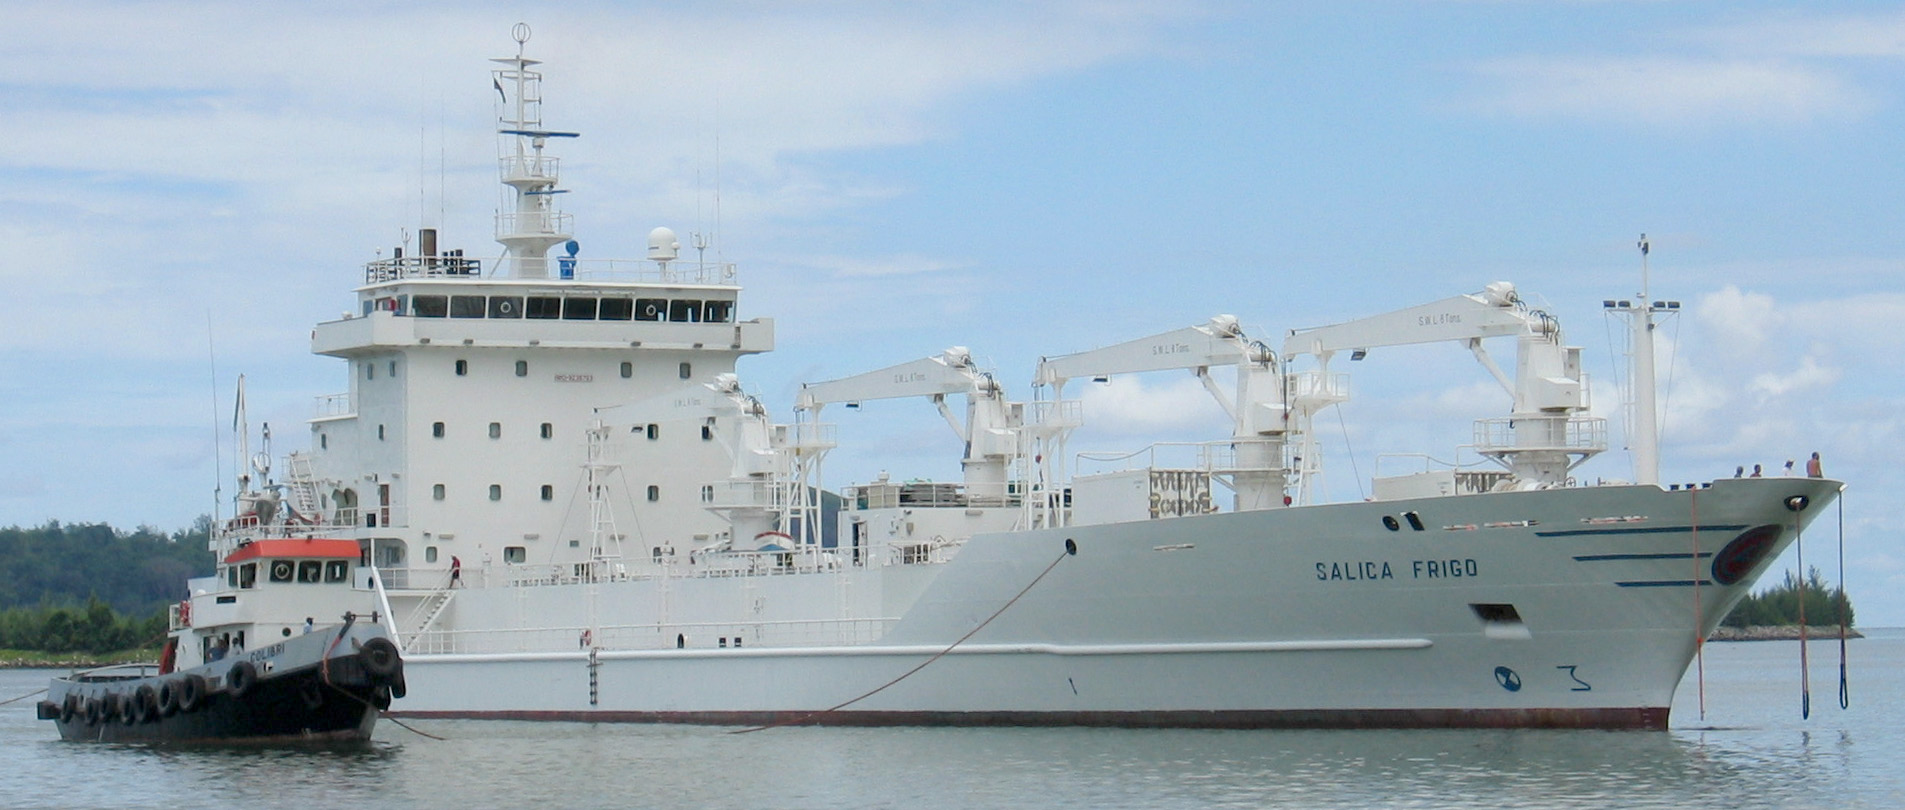 Reefer ship - Wikipedia